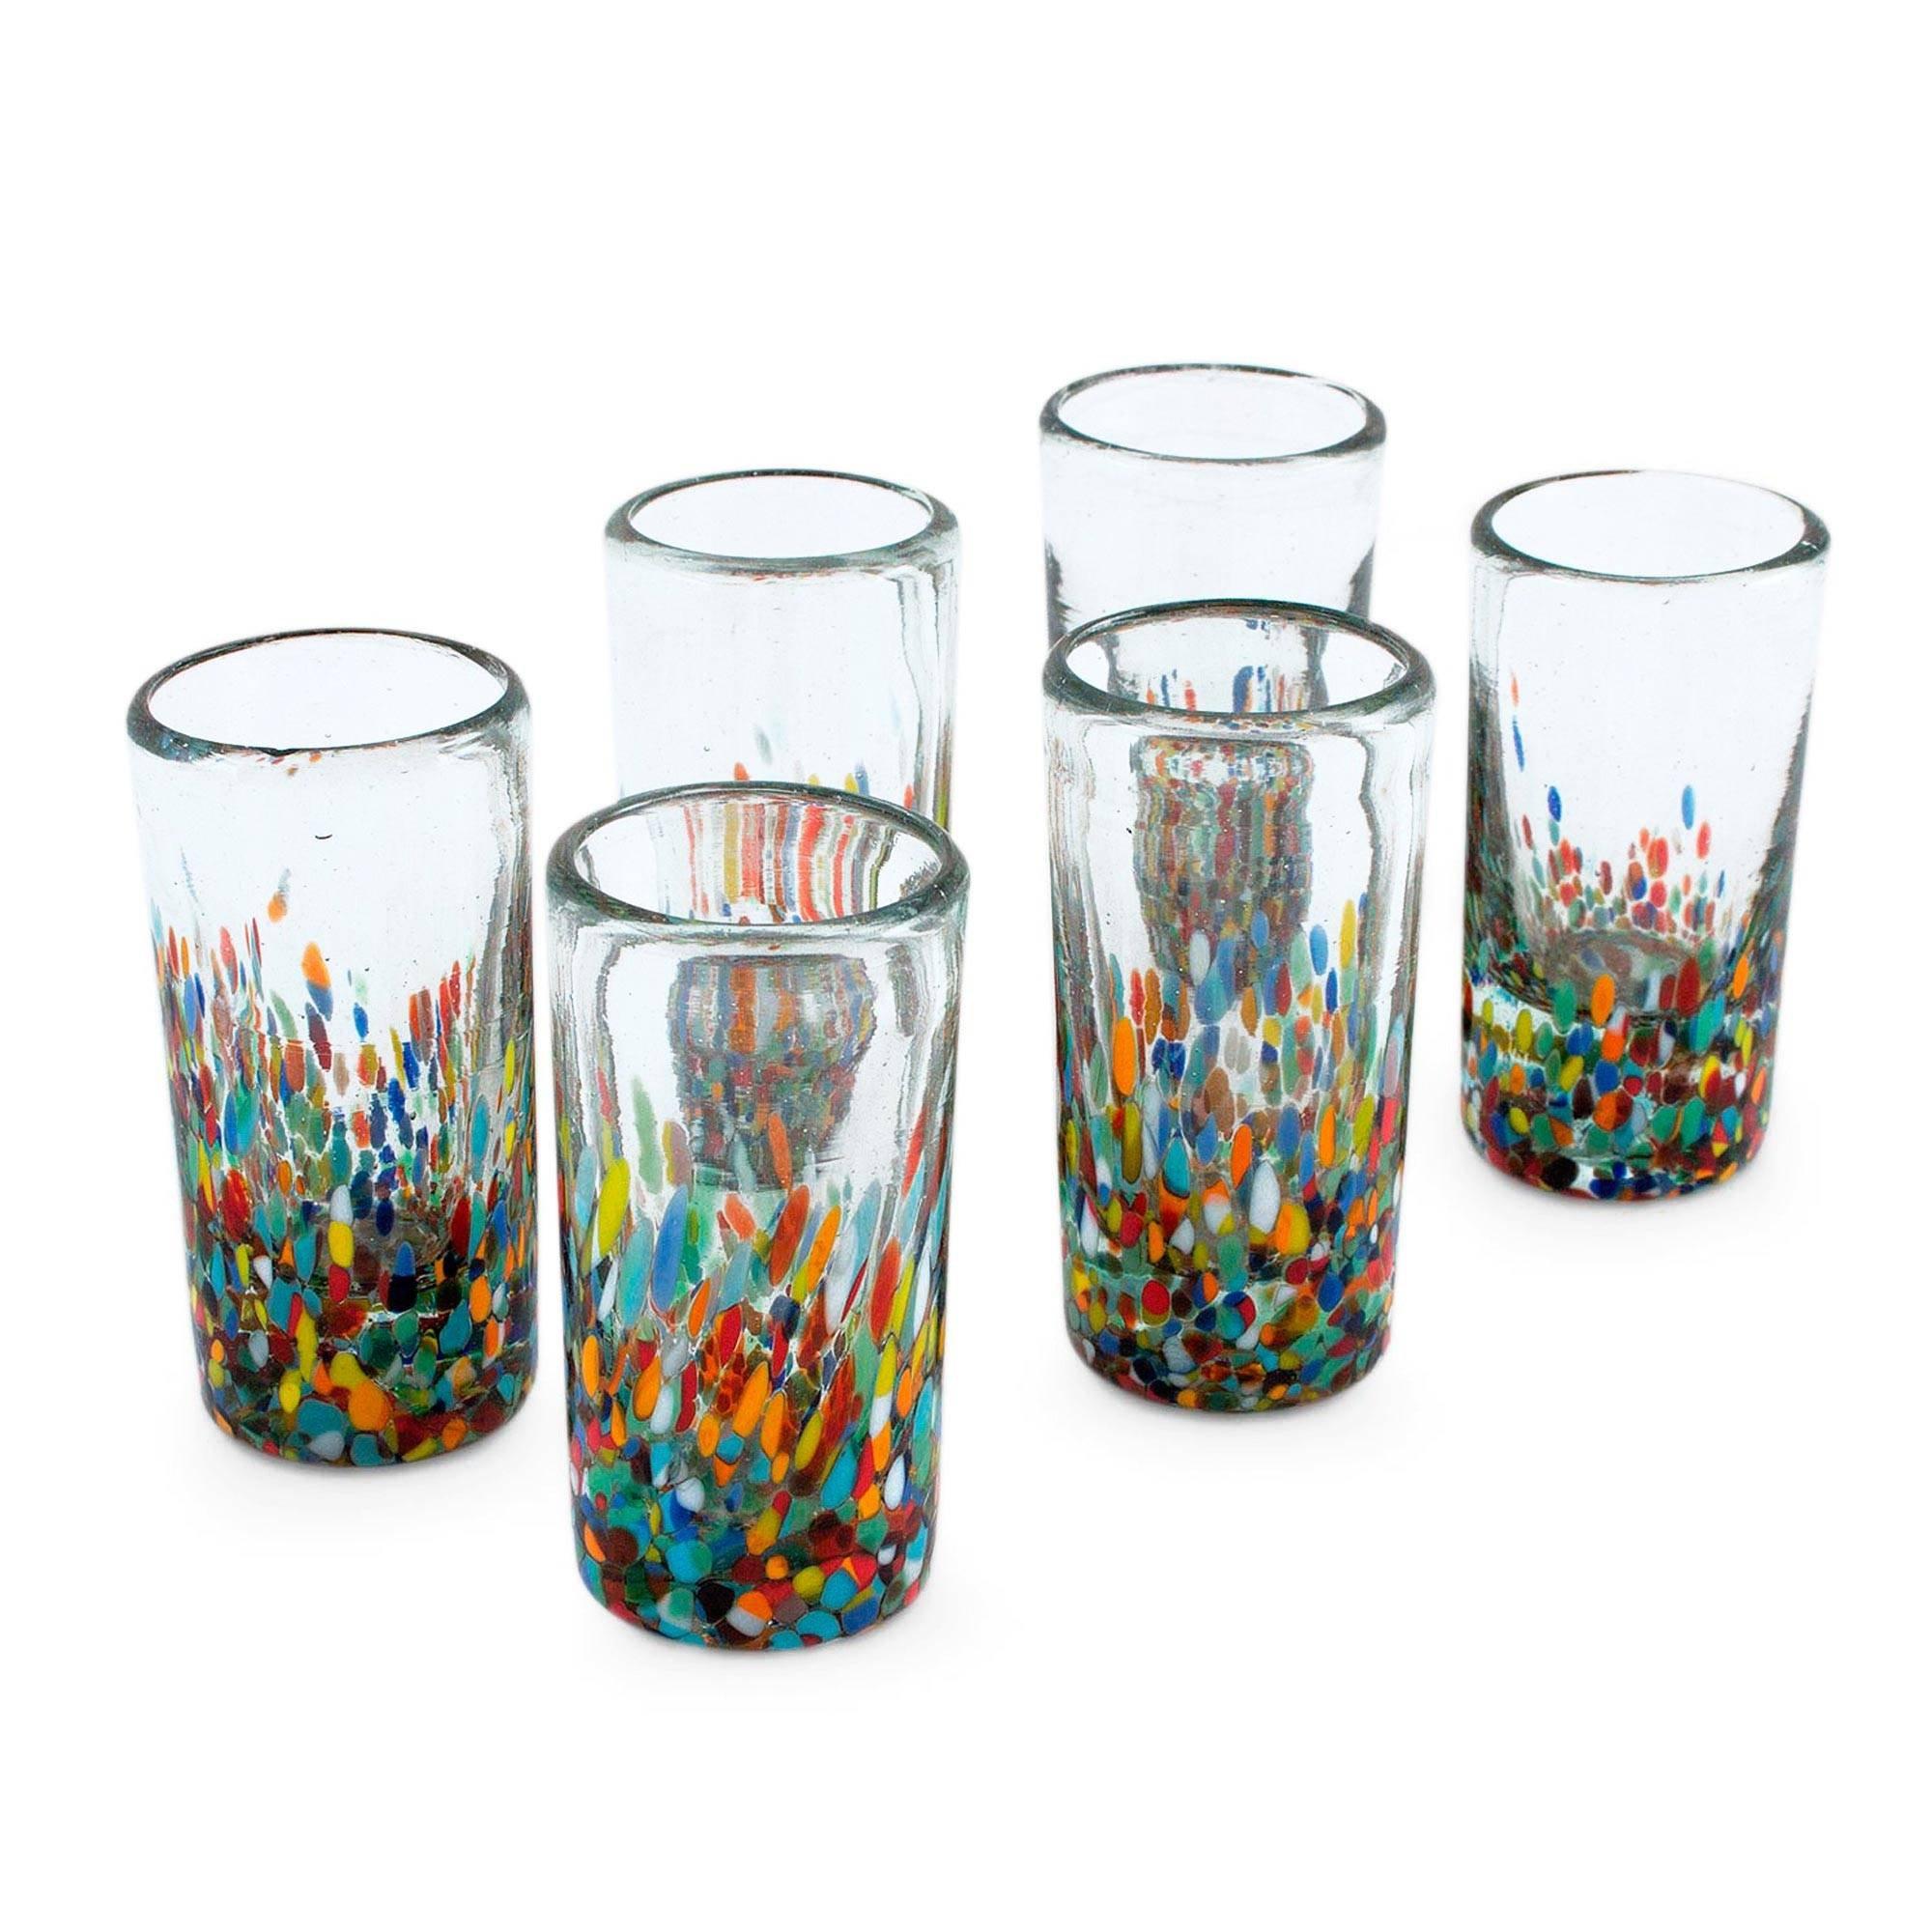 NOVICA Hand Blown Recycled Glass Confetti Shot Glasses, 2 oz 'Carnival' (set of 6)